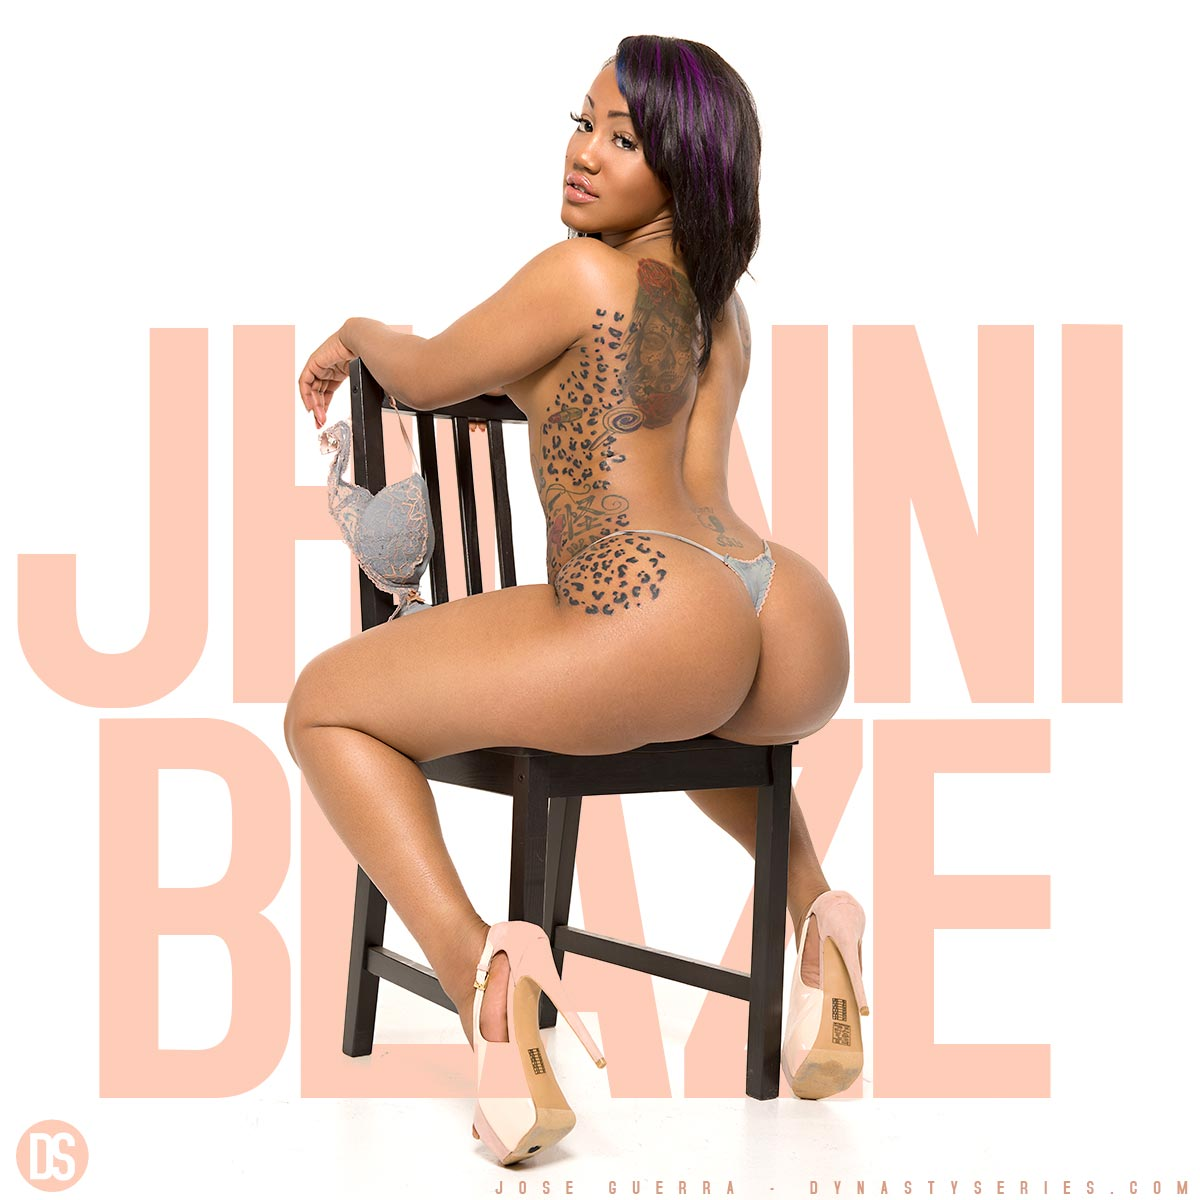 Jhonni Blaze Grey Blaze #TastyModel  4